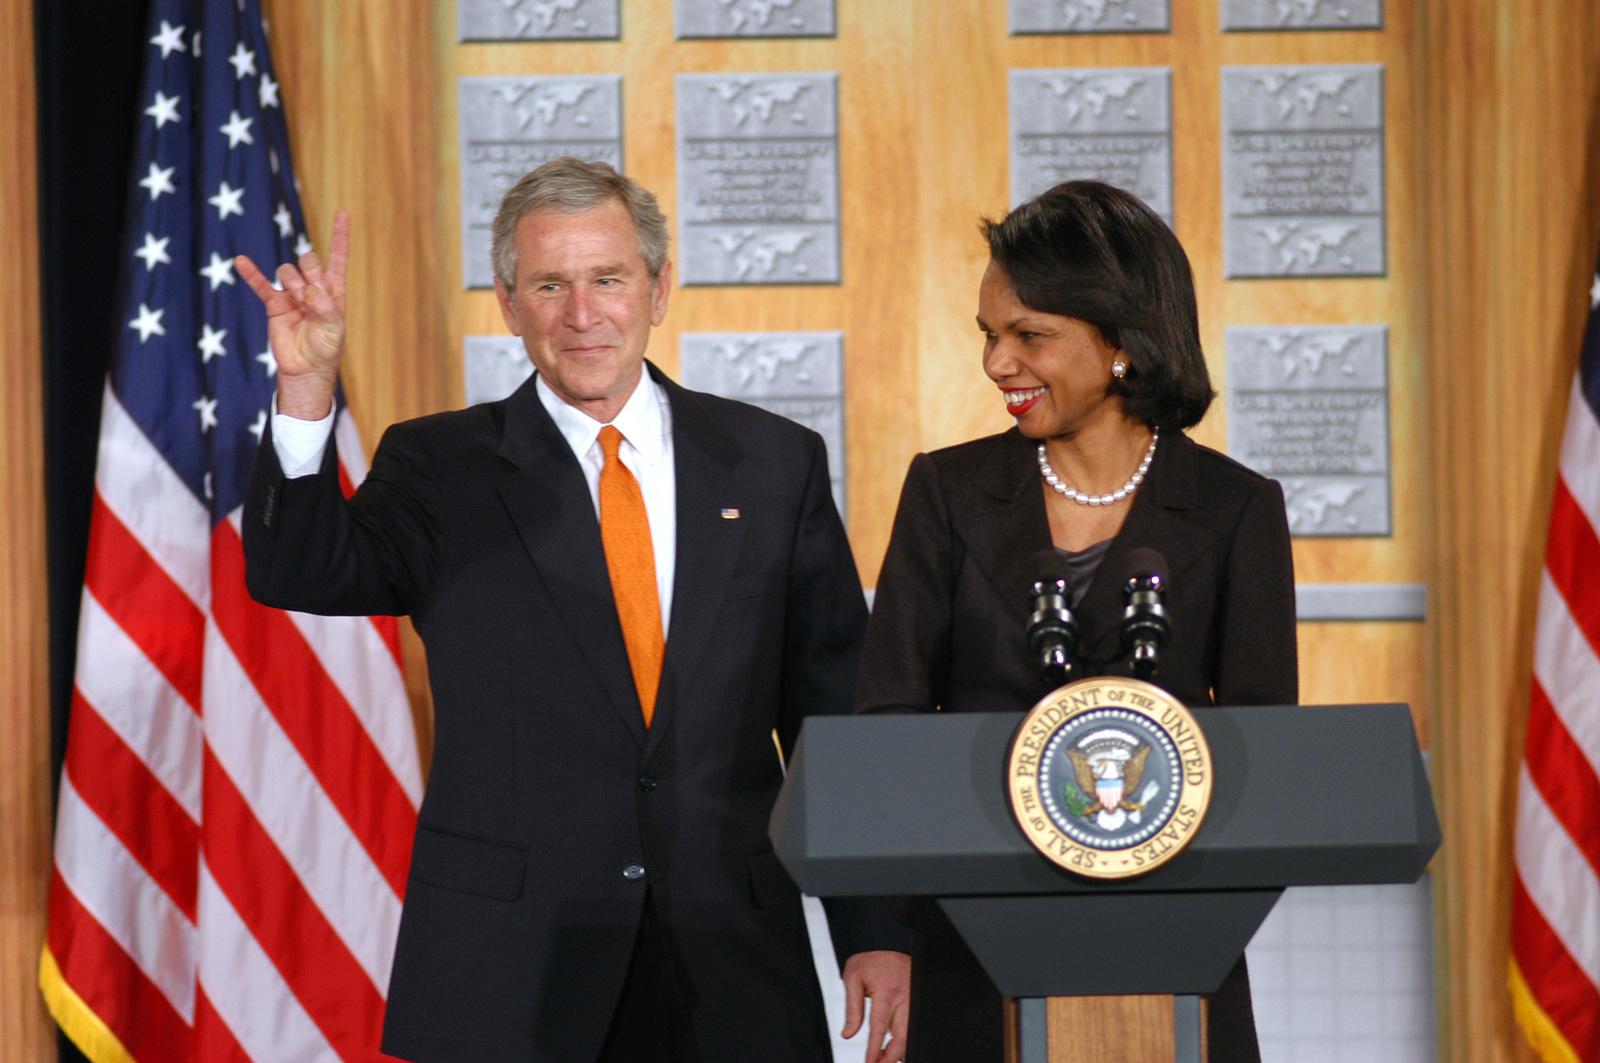 [Assignment: 59-CF-DS-26241-06] President George Bush with Secretary Condoleezza Rice at Summit of U.S. University Presidents on International Education, Dean Acheson Auditorium [Photographer: Mark Stewart--State] [59-CF-DS-26241-06_DSC_0173.jpg]